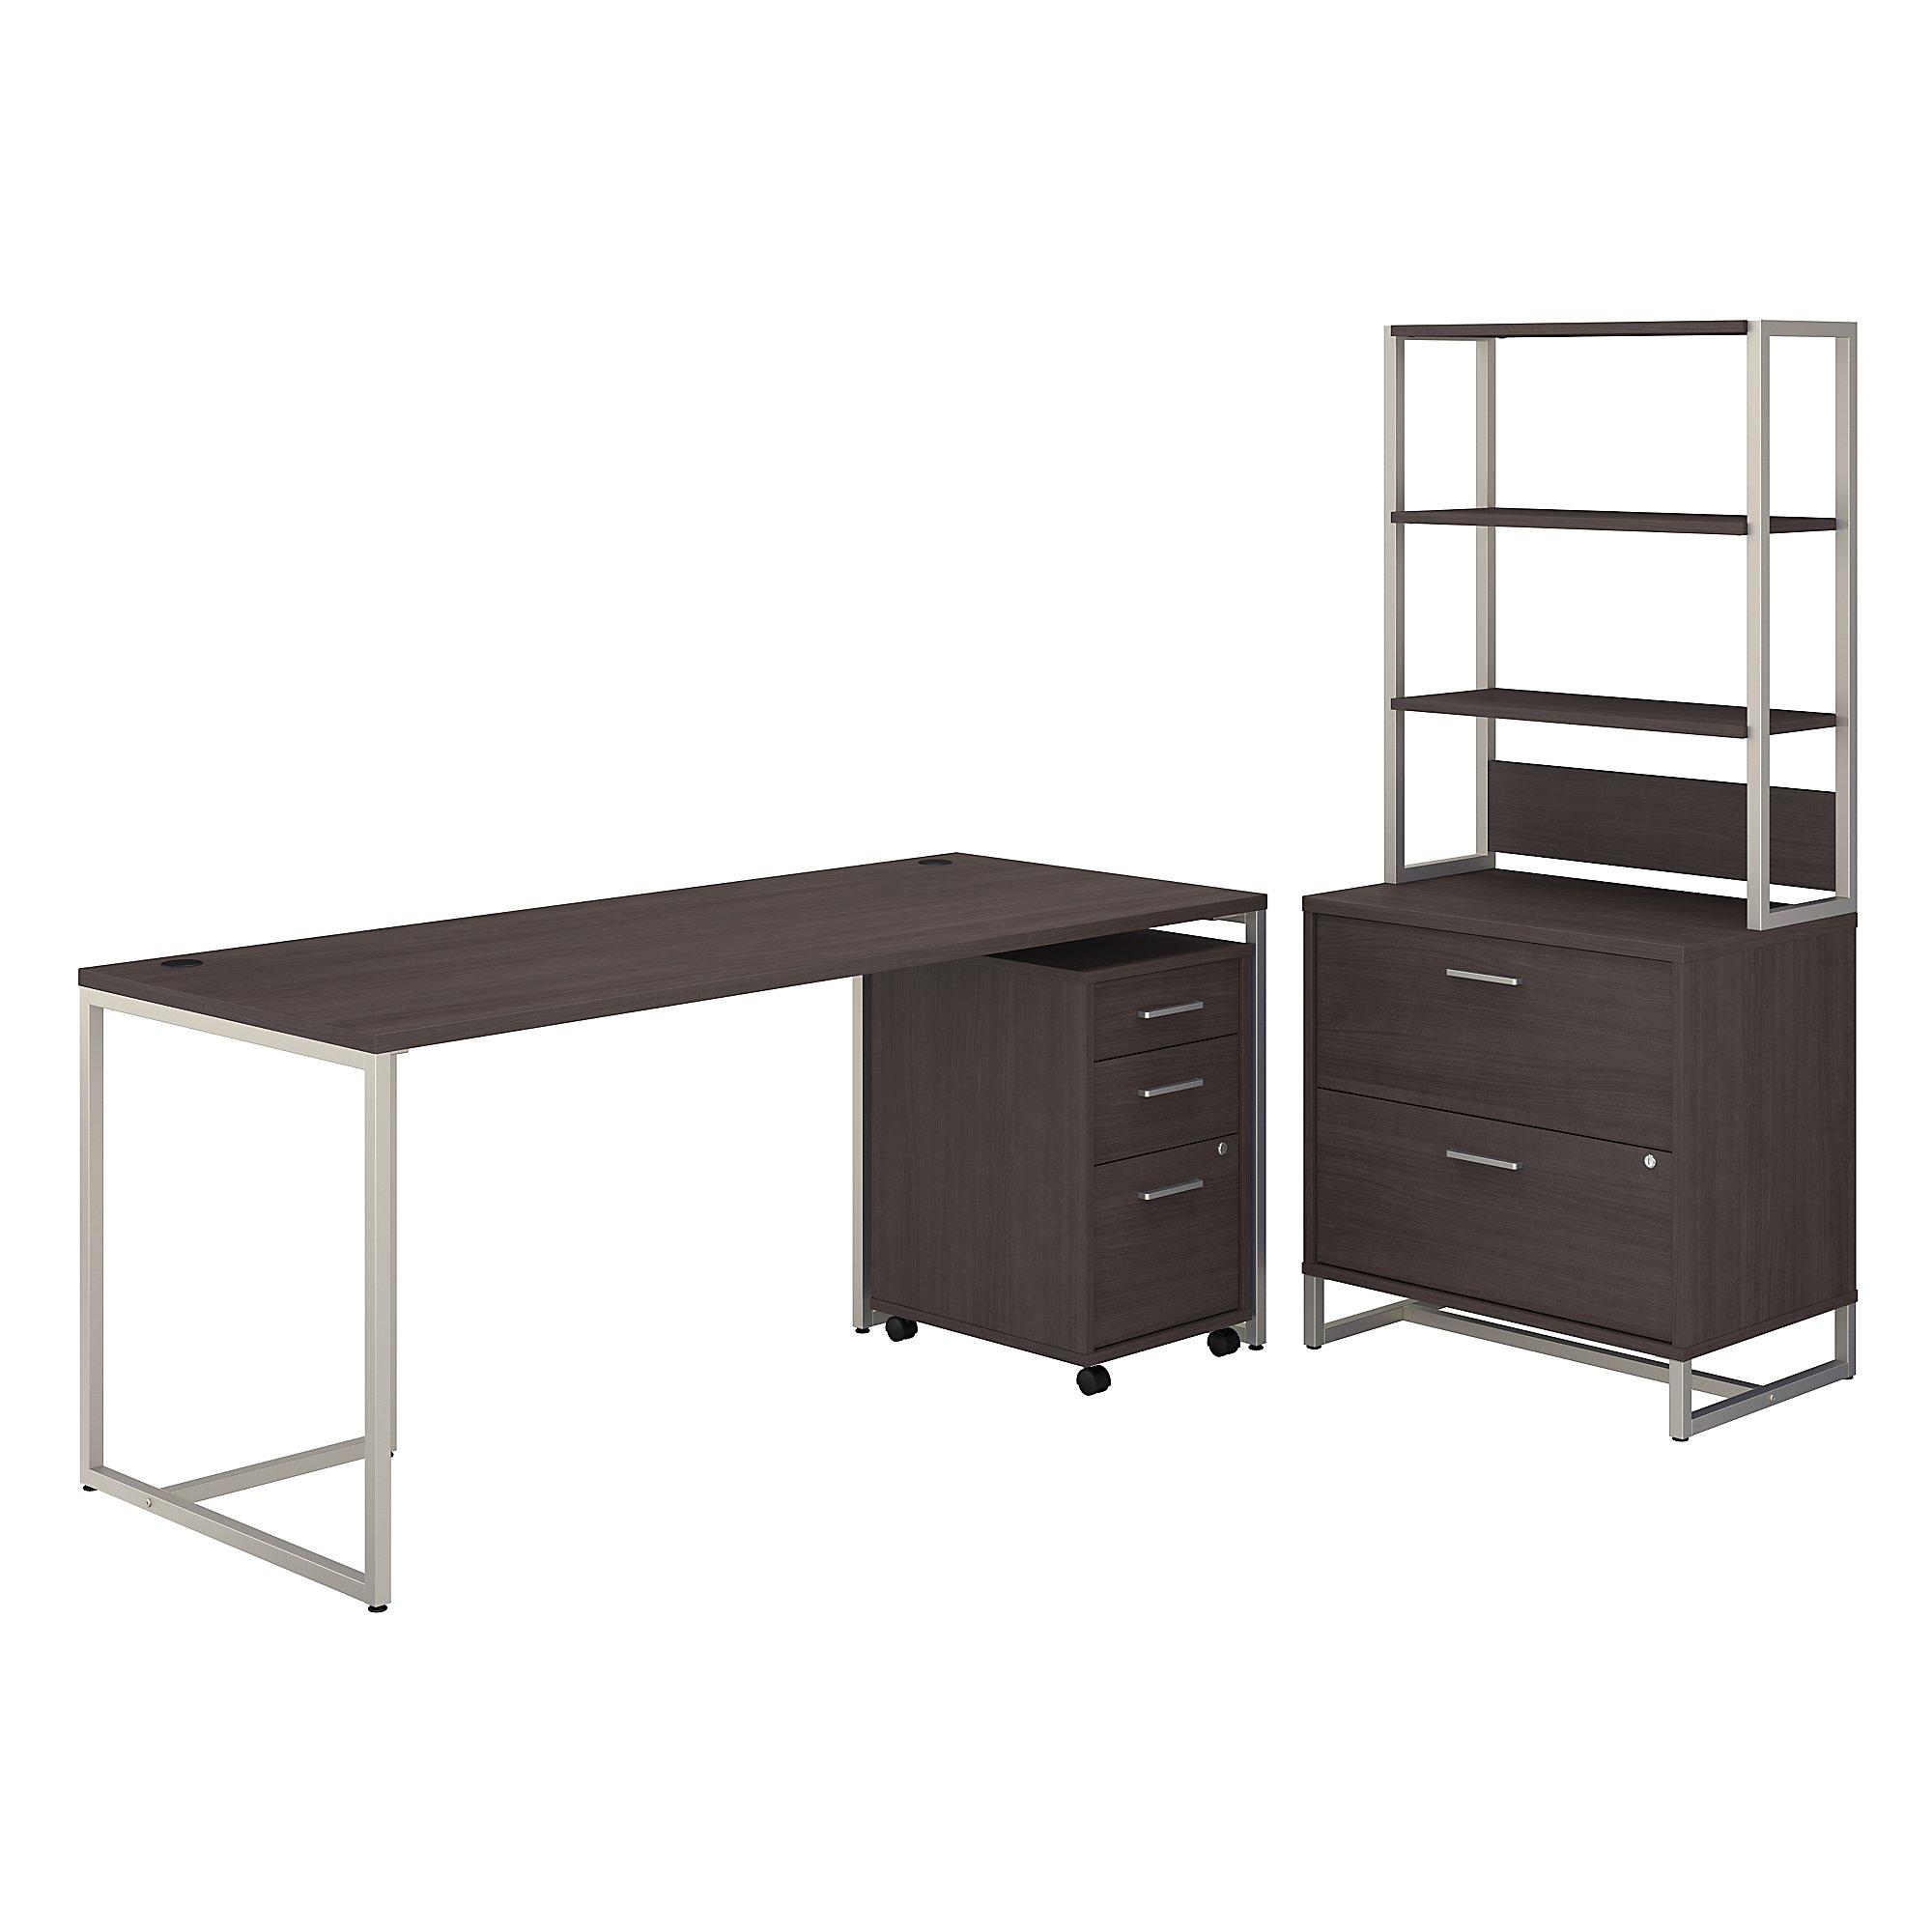 kathy ireland method office furniture set in storm gray